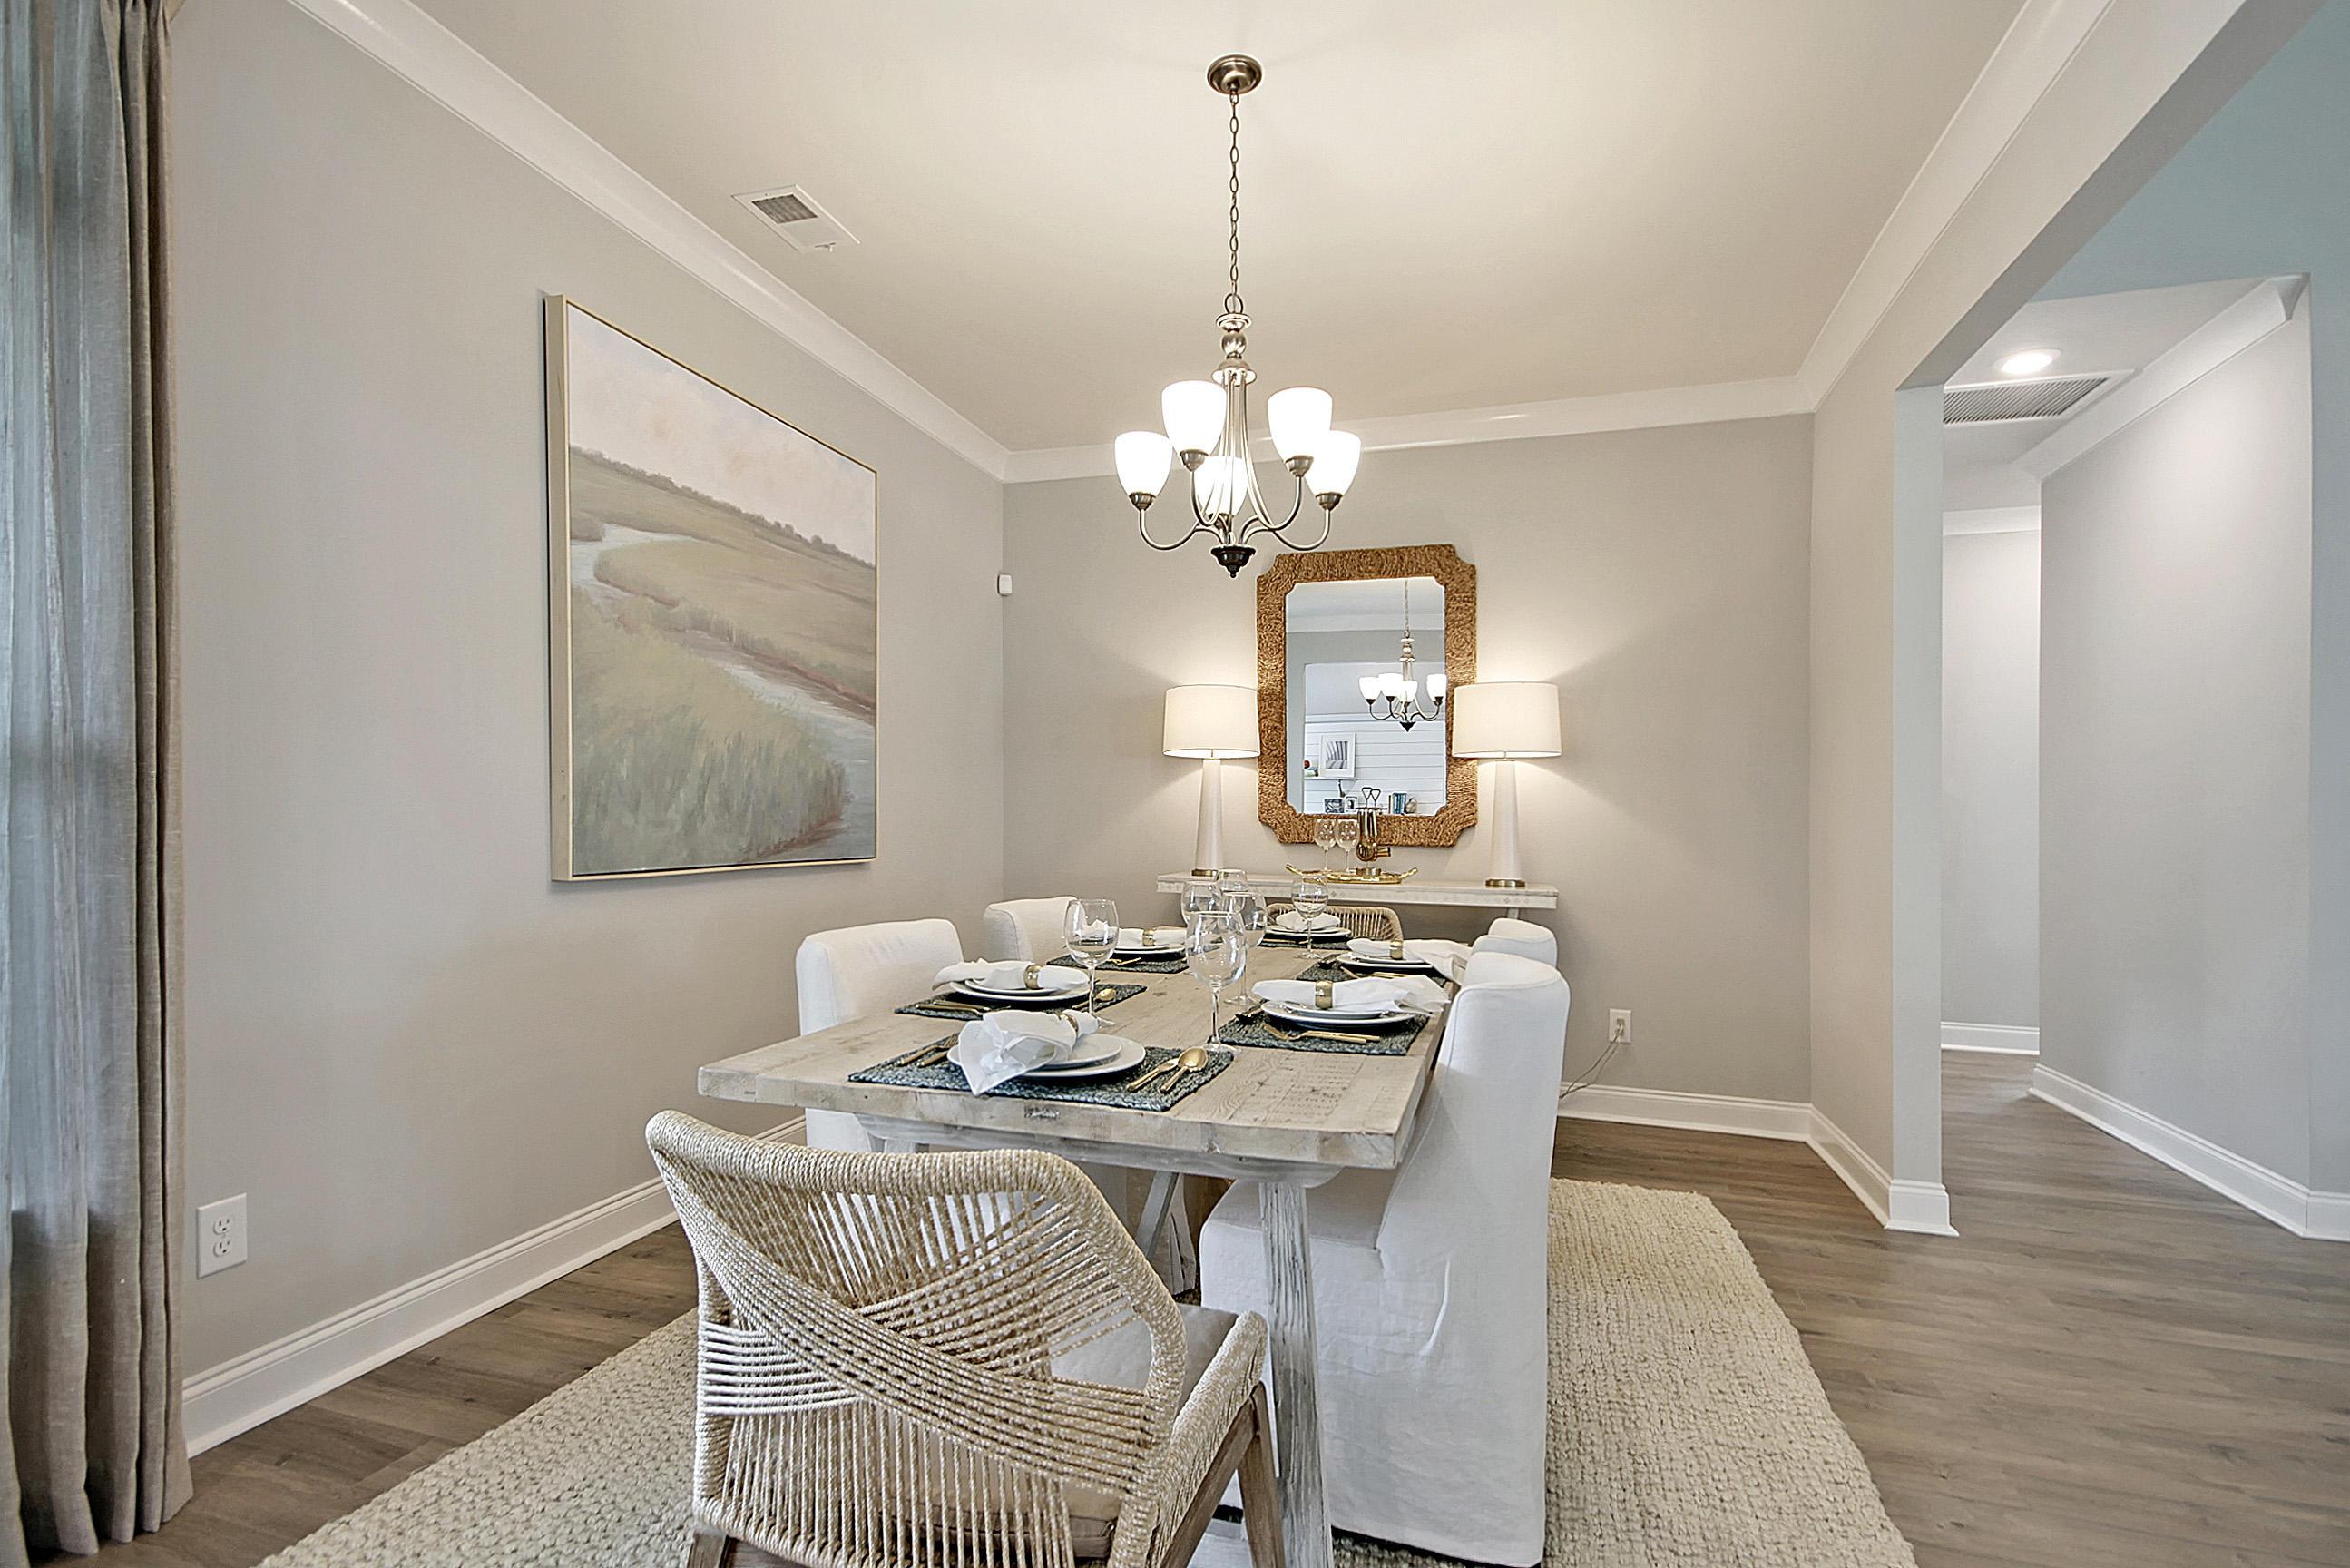 Park West Homes For Sale - 3066 Rice Field, Mount Pleasant, SC - 25